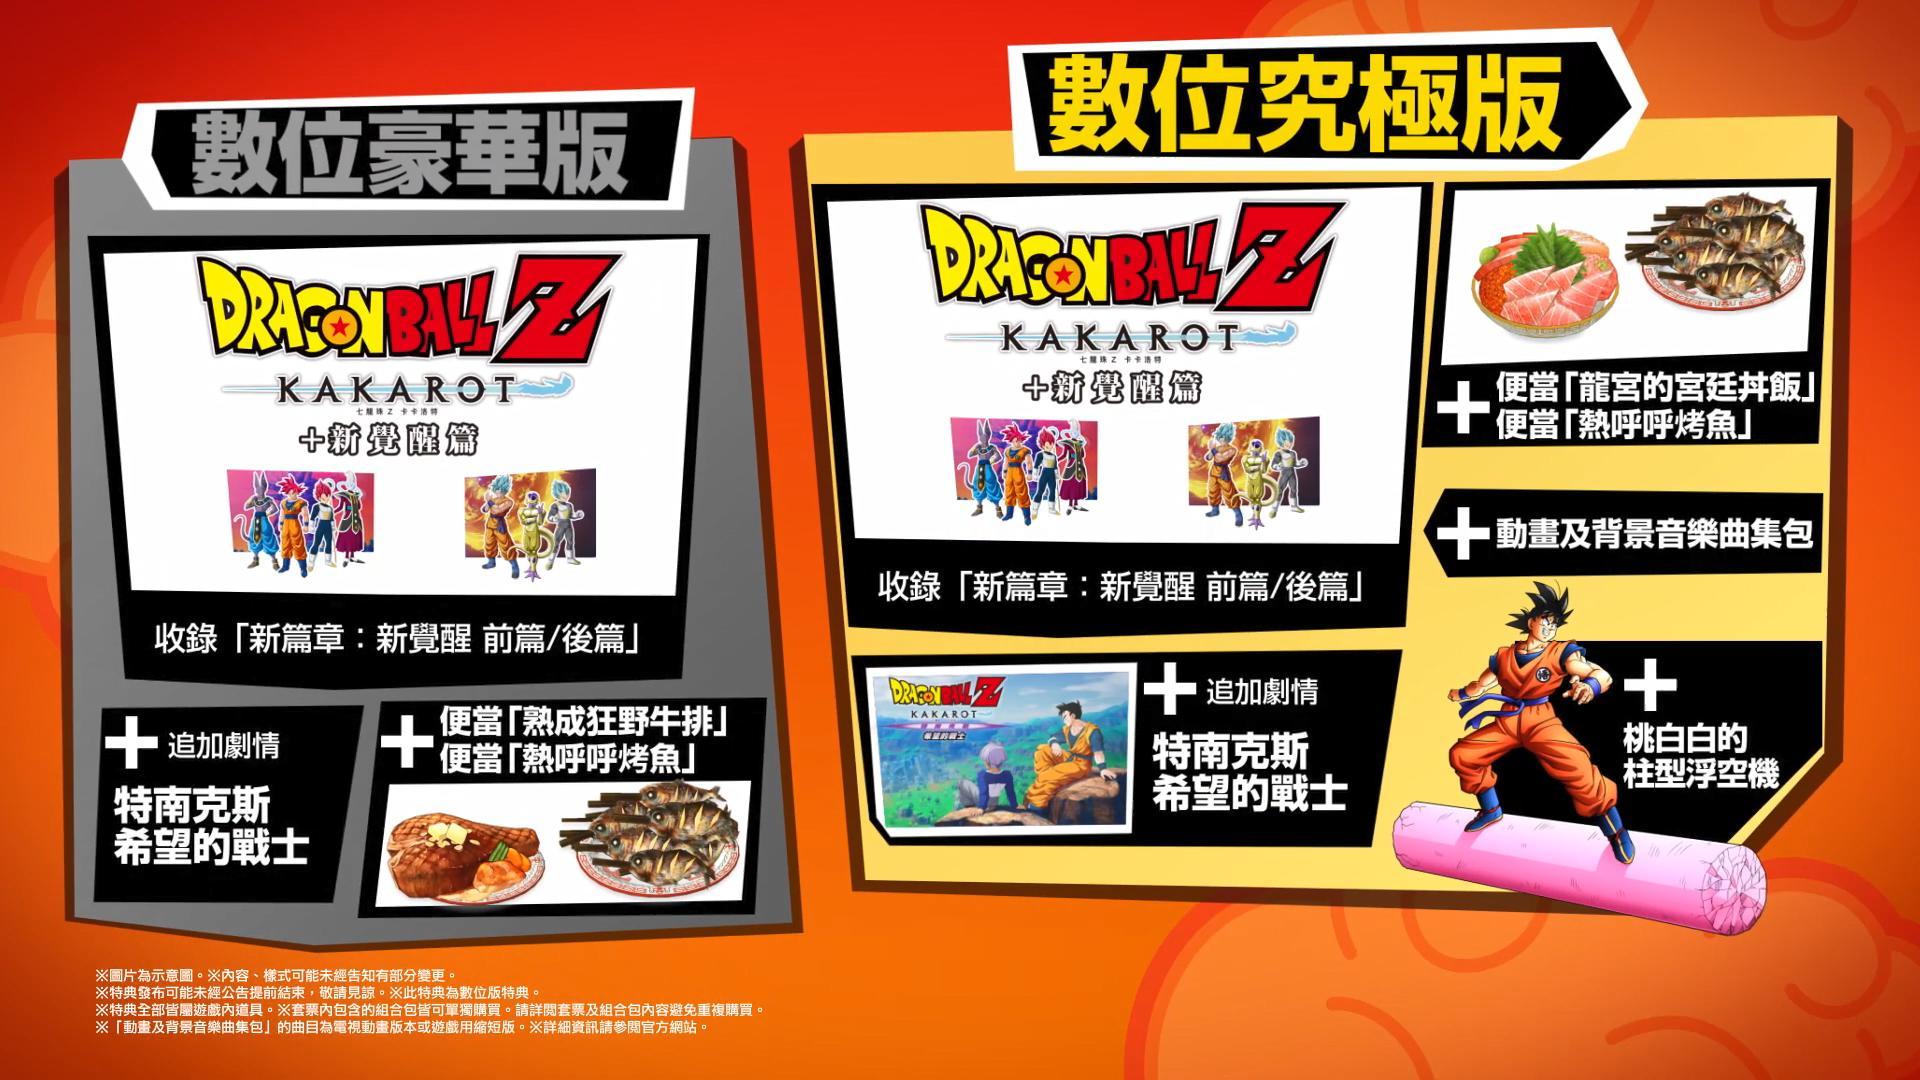 Switch版《龙珠Z卡卡罗特》战斗介绍宣传片 特典内容公布